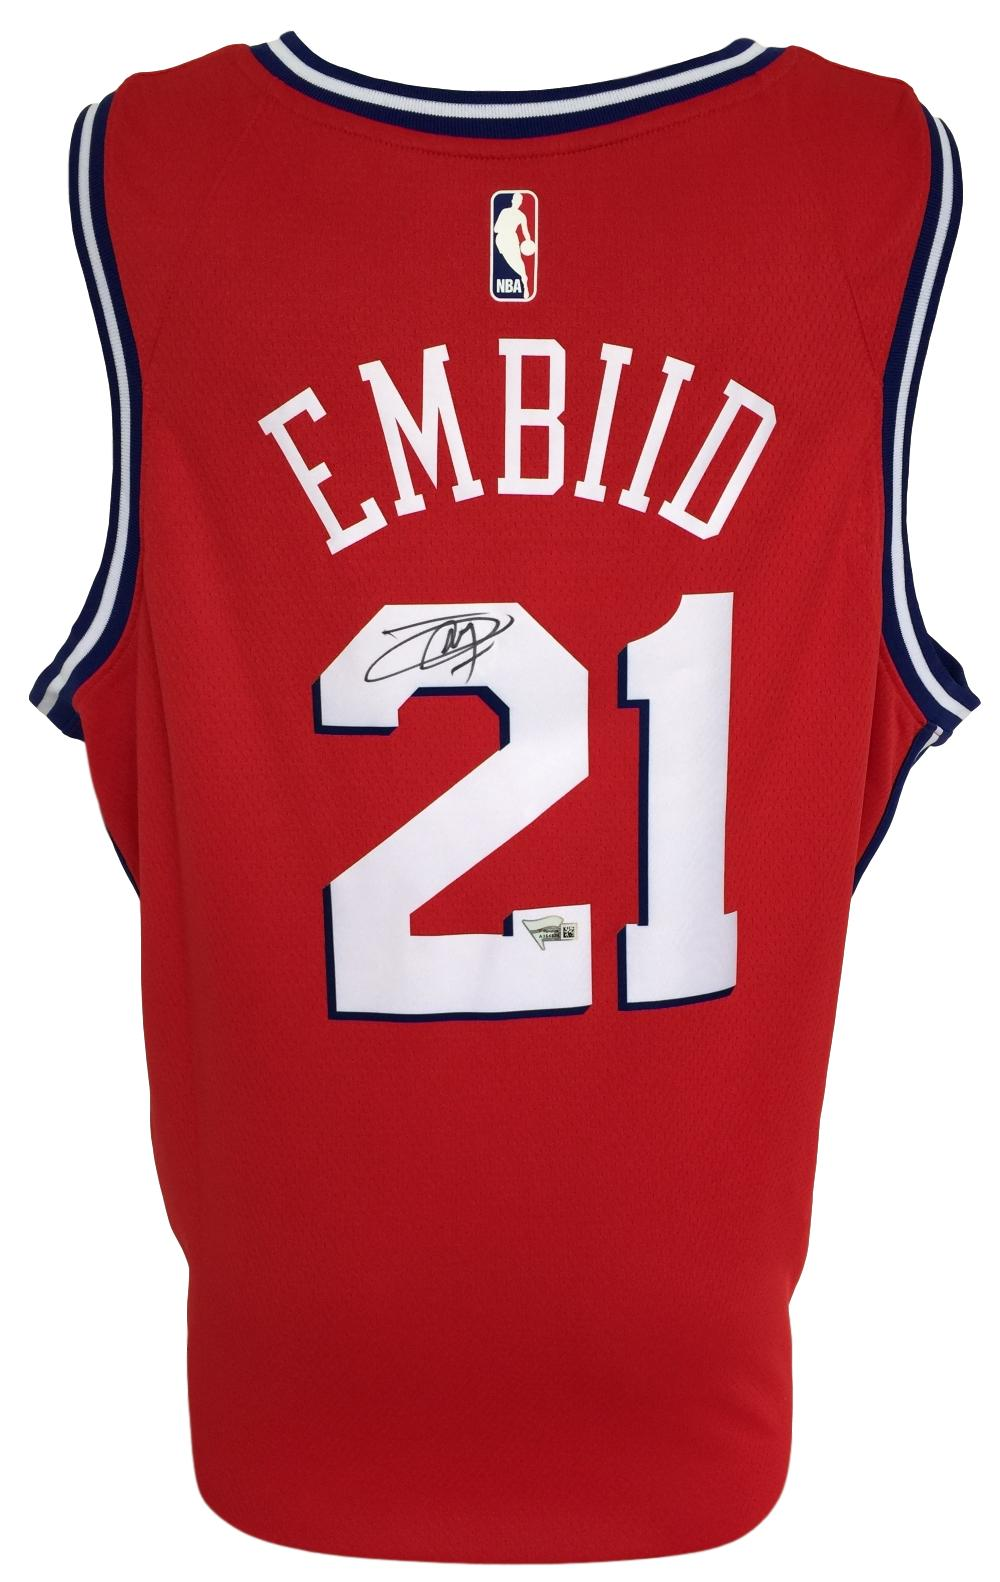 sports shoes b4426 3b9fb Details about Joel Embiid Signed 76ers Red Nike Swingman Jersey Fanatics  A364834